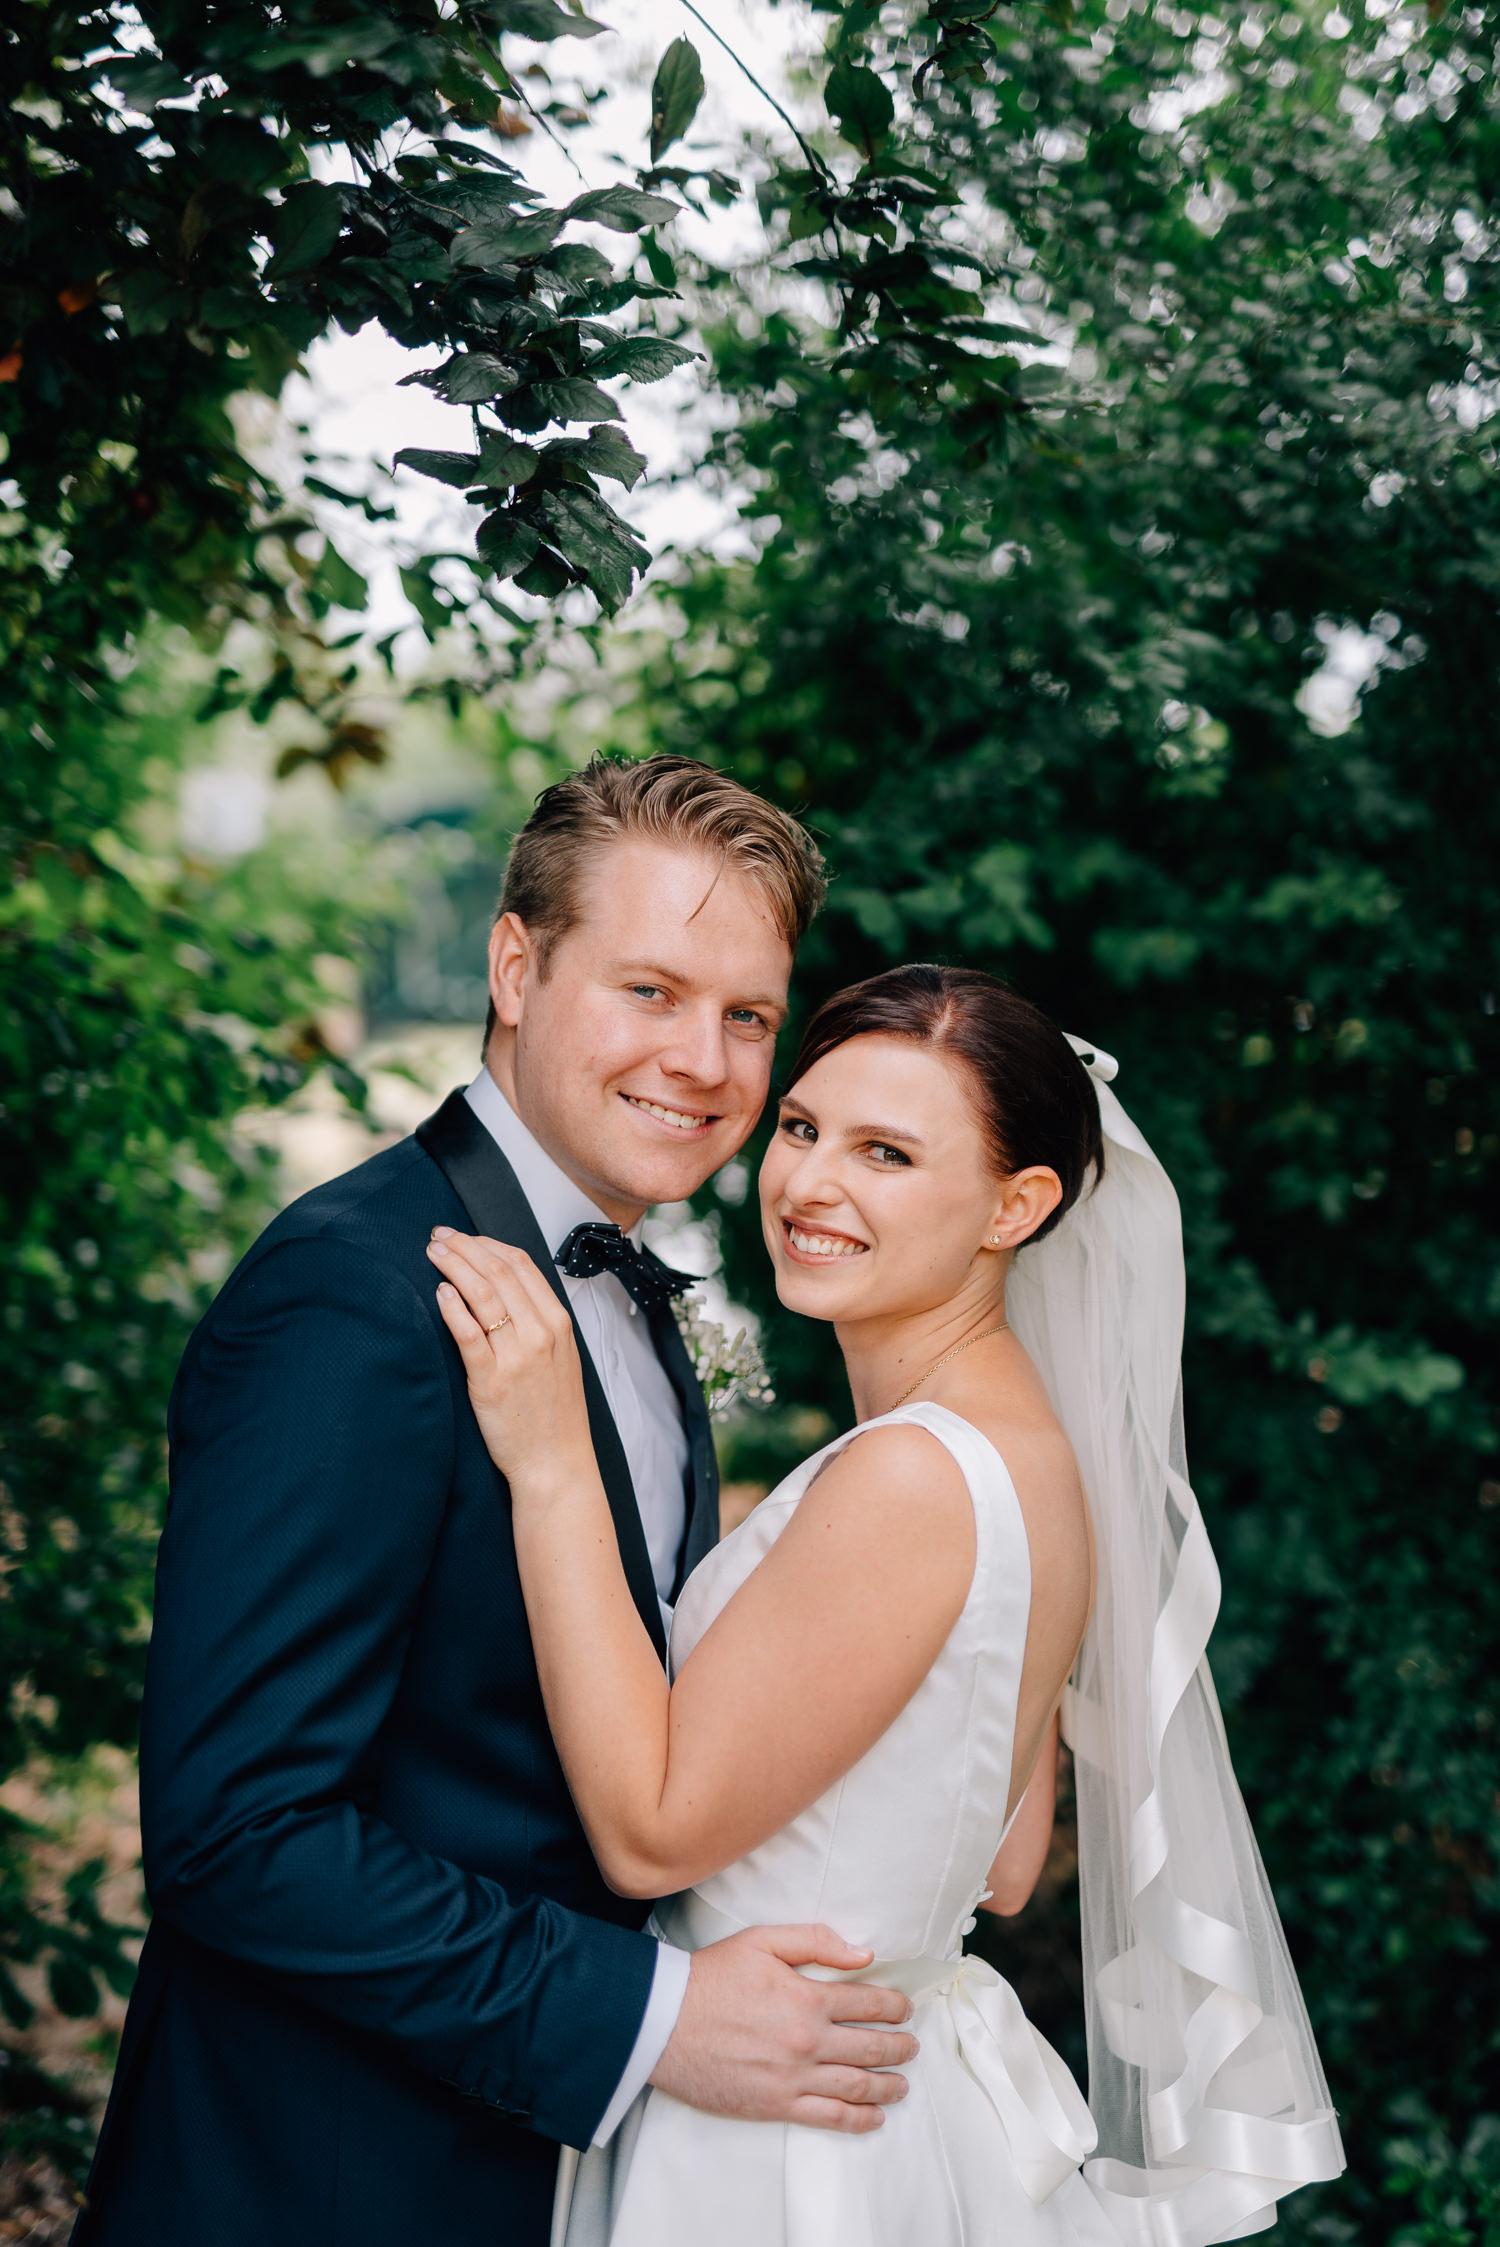 Josef-Chromy-Wedding-Photographer-46.jpg